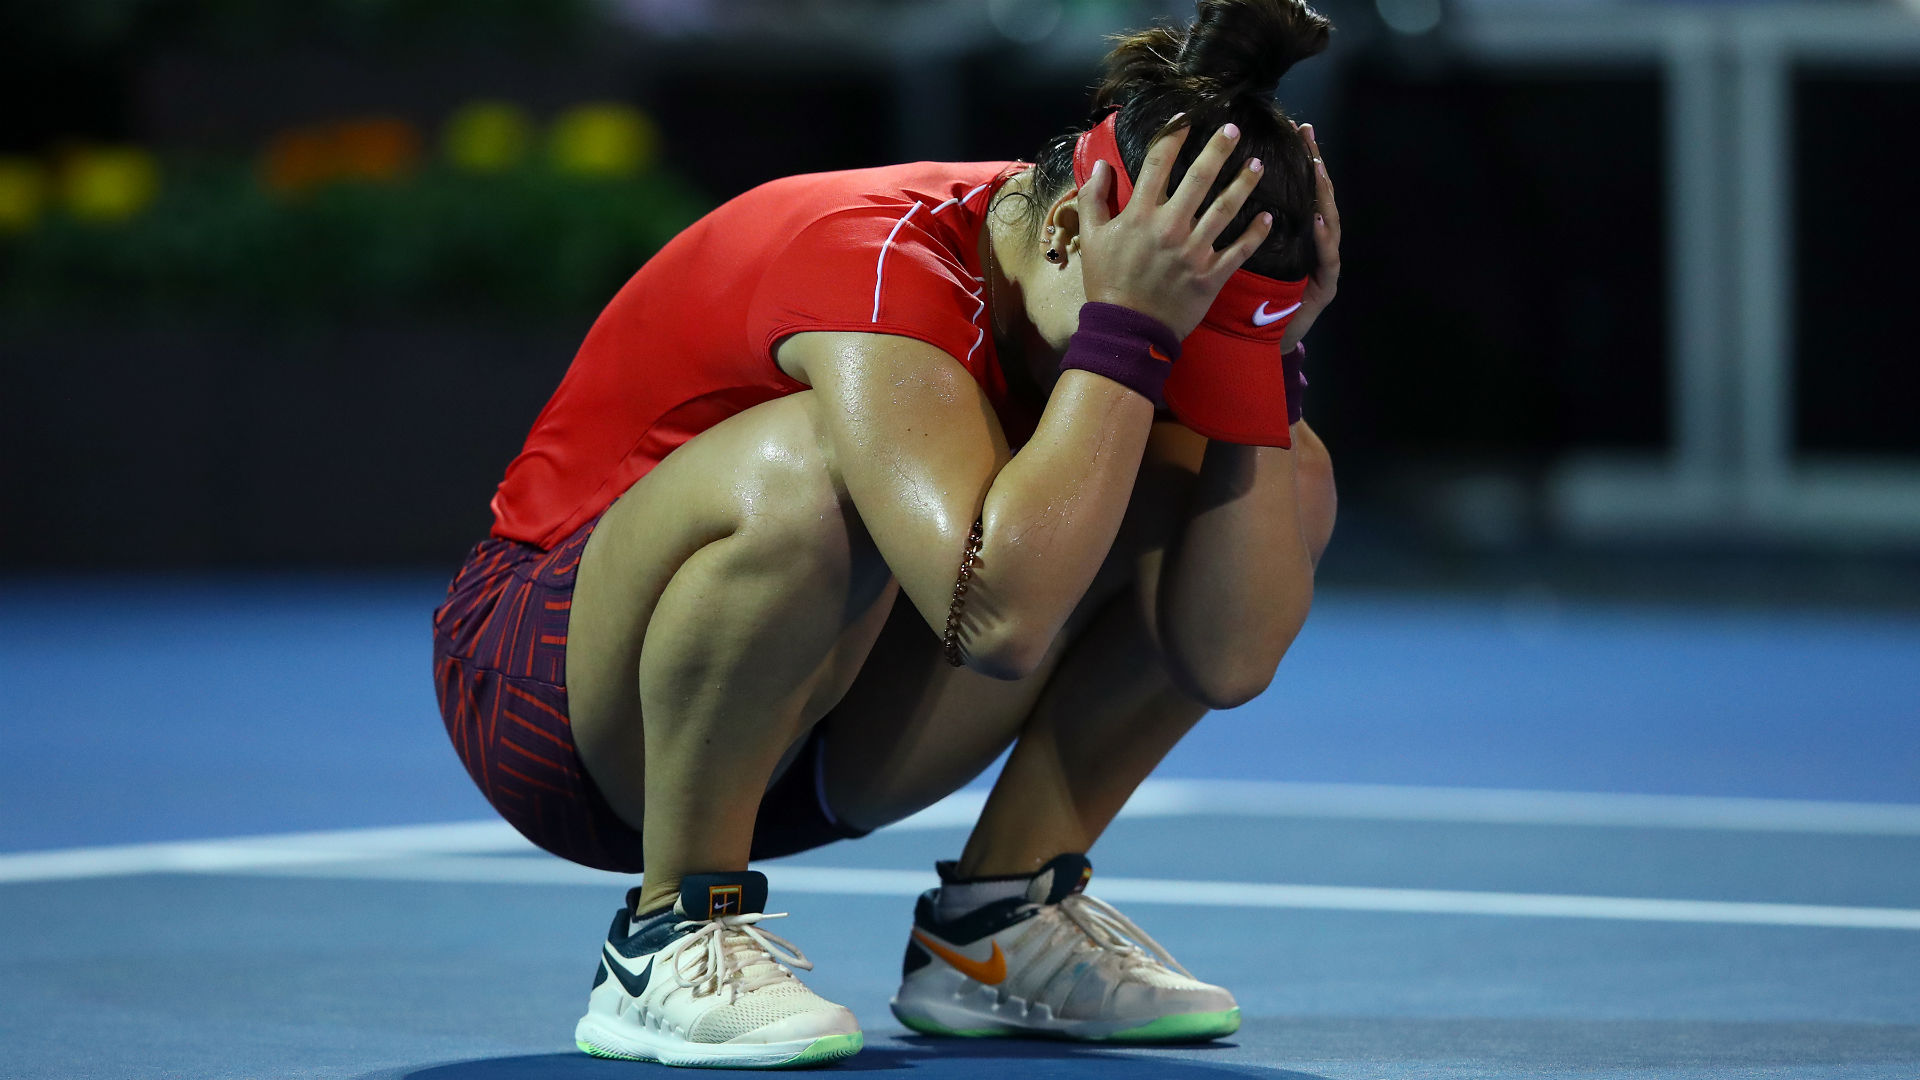 Caroline Wozniacki Stunned By World Number 152 Andreescu